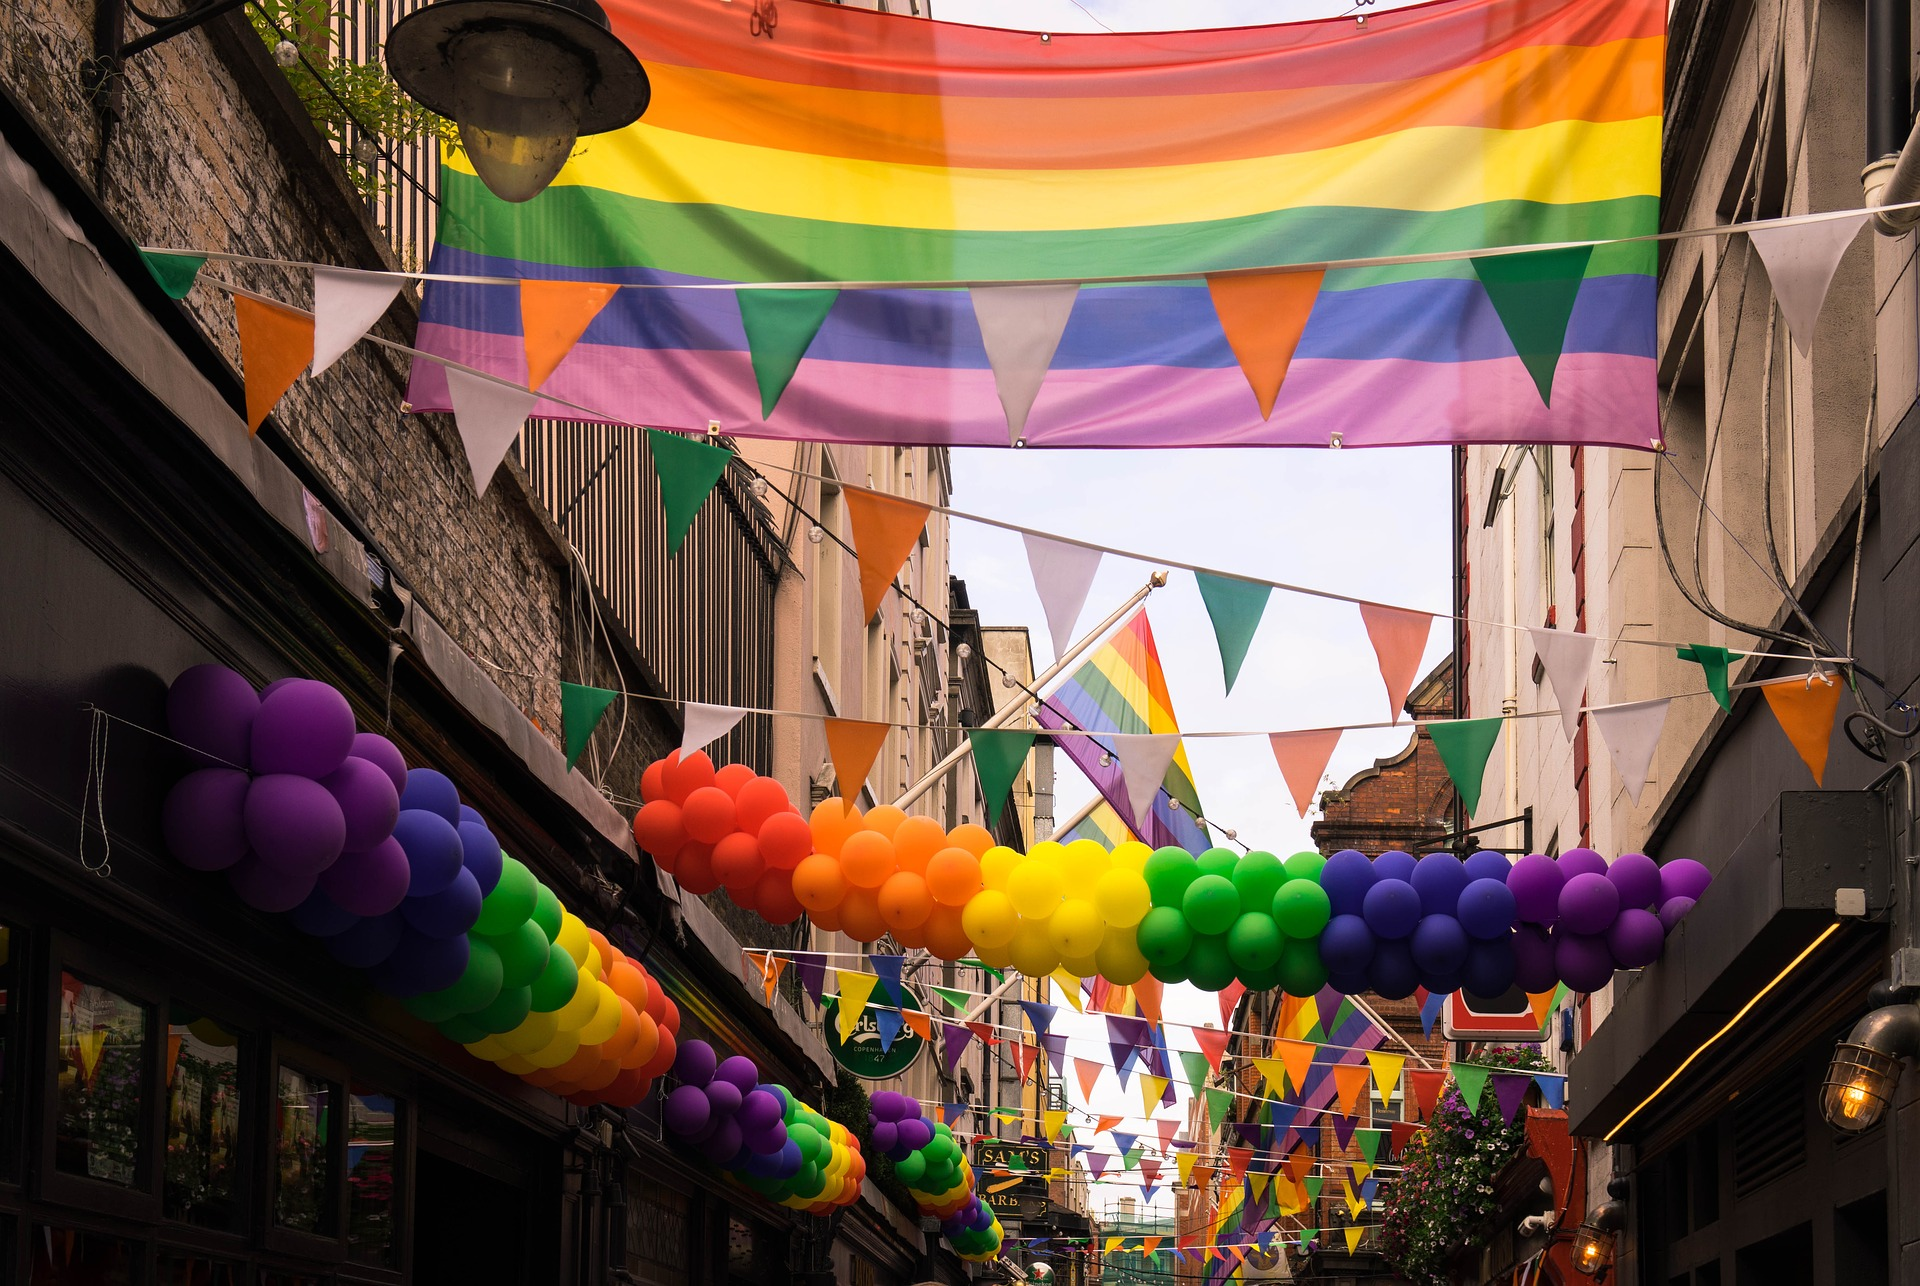 gay-2507365_1920.jpg